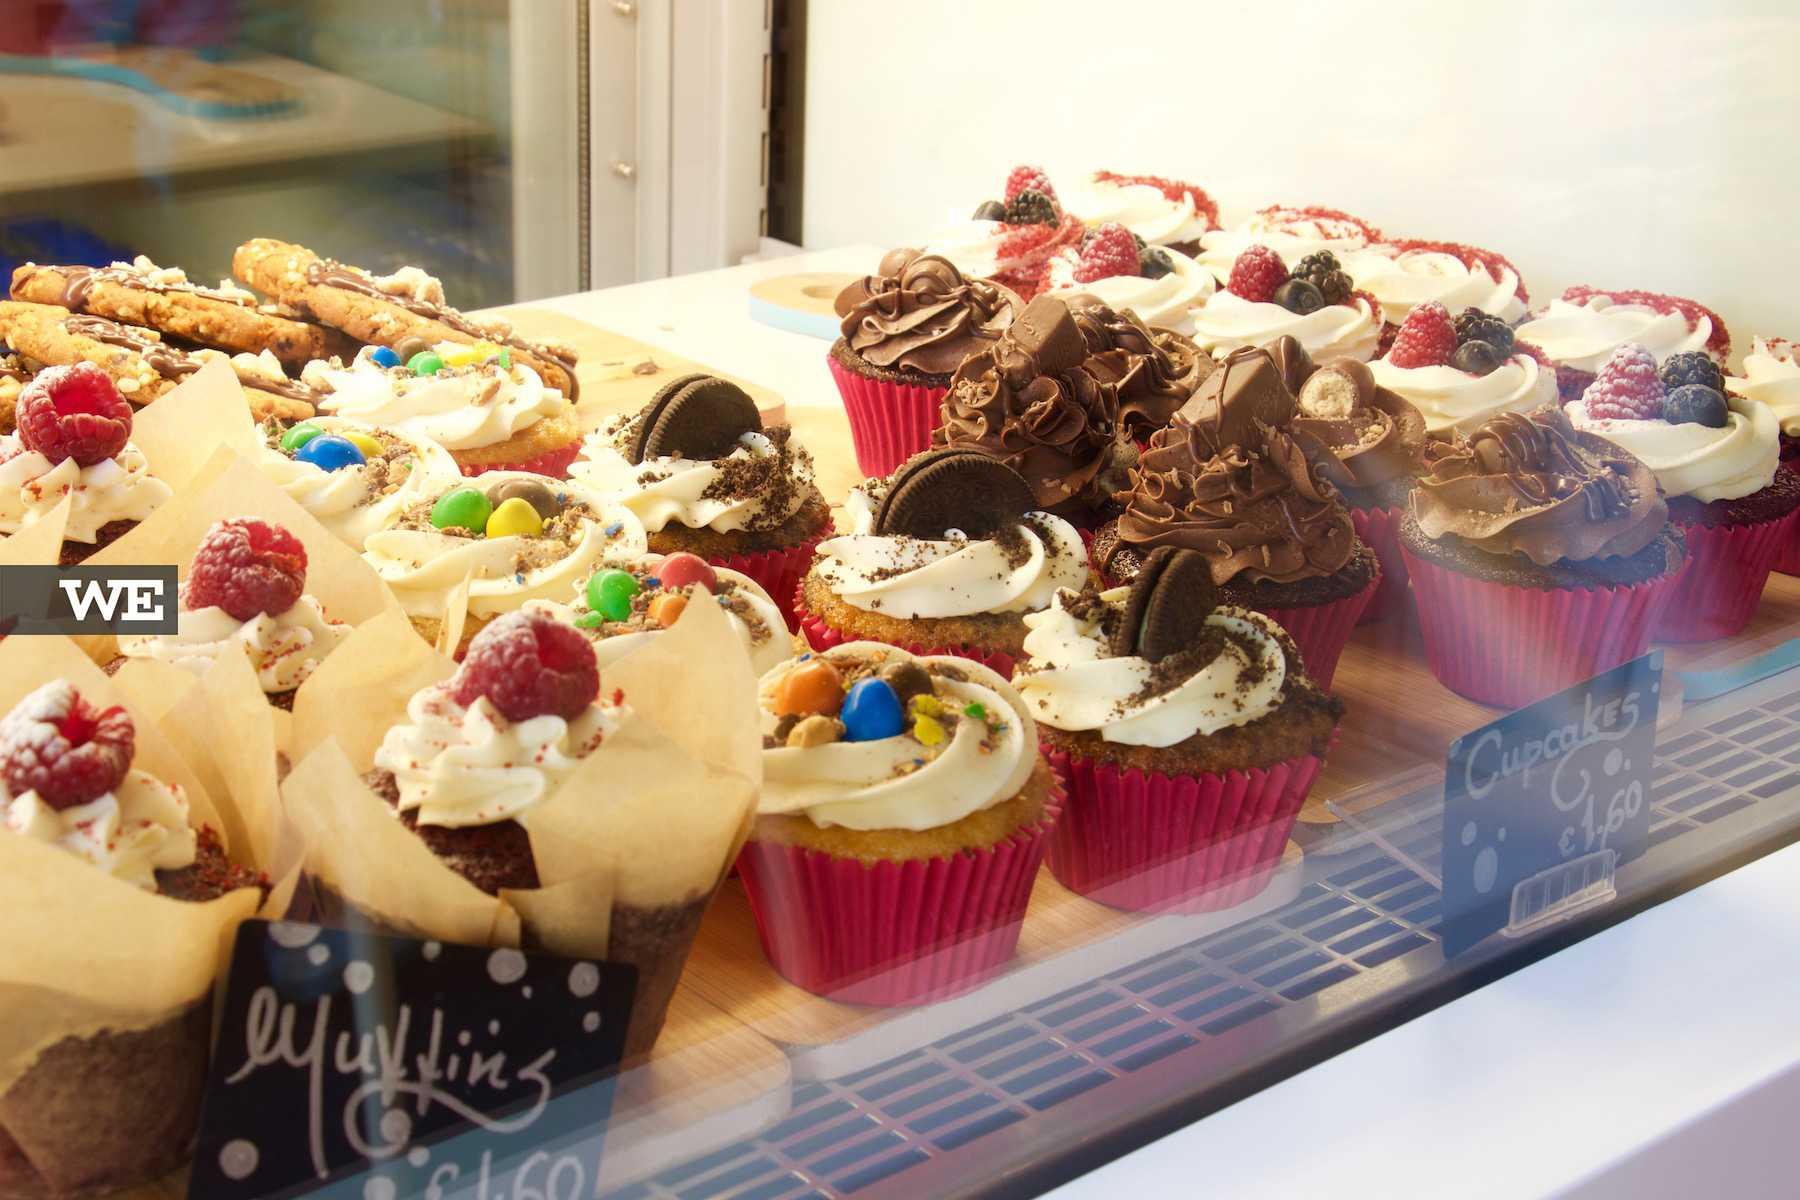 we-braga-spirito-cupcakes